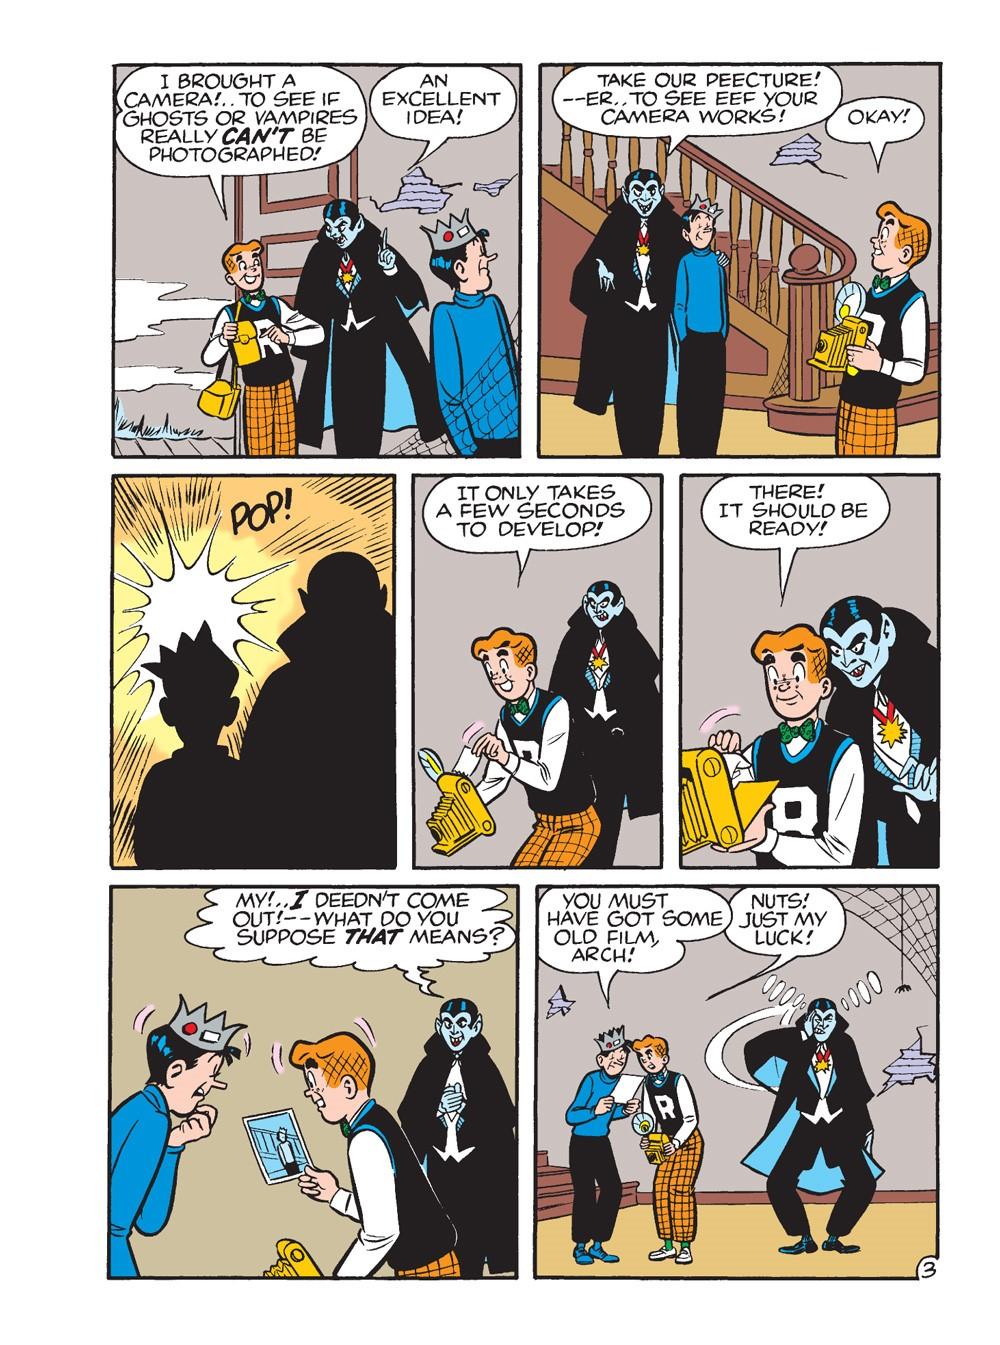 WorldOfArchieJumboComicsDigest_113-64 ComicList Previews: WORLD OF ARCHIE JUMBO COMICS DIGEST #113